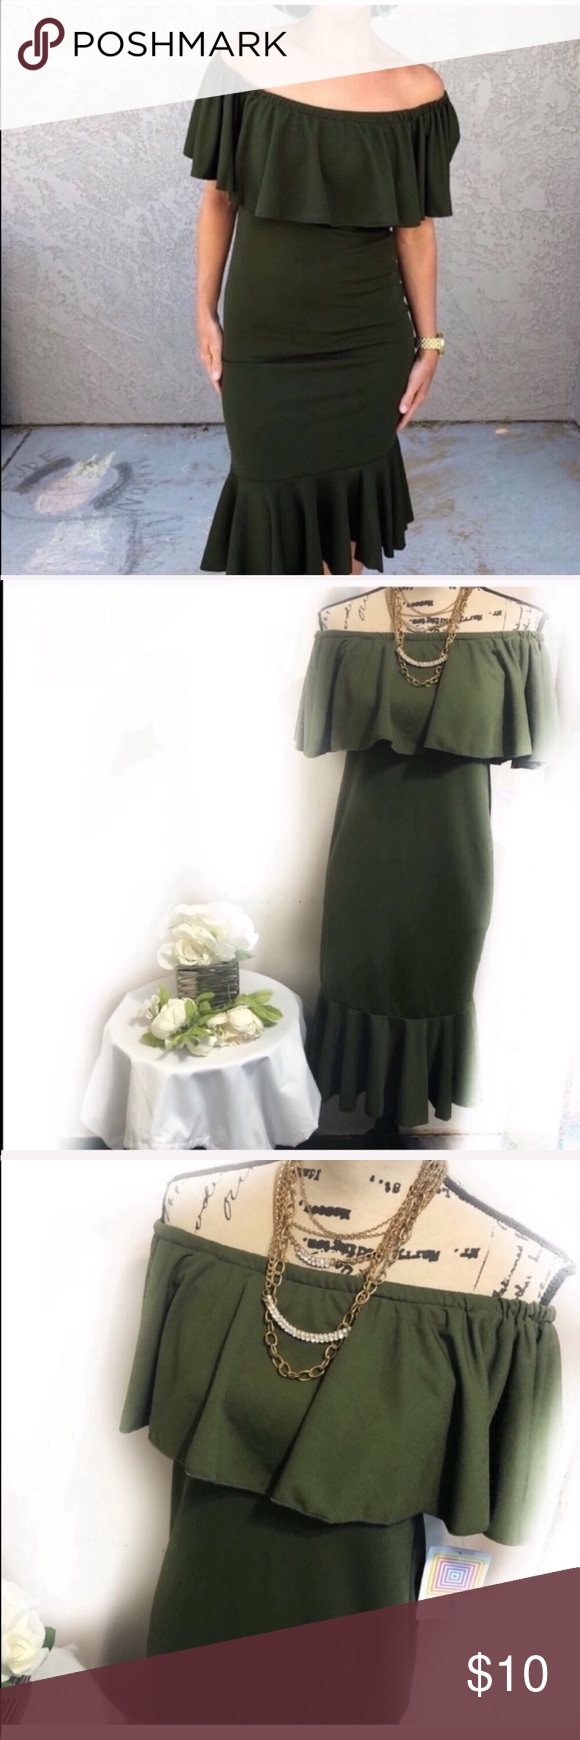 Best Lularoe Cici Dress Black Friday Deal Nwt Olive Green 400 x 300